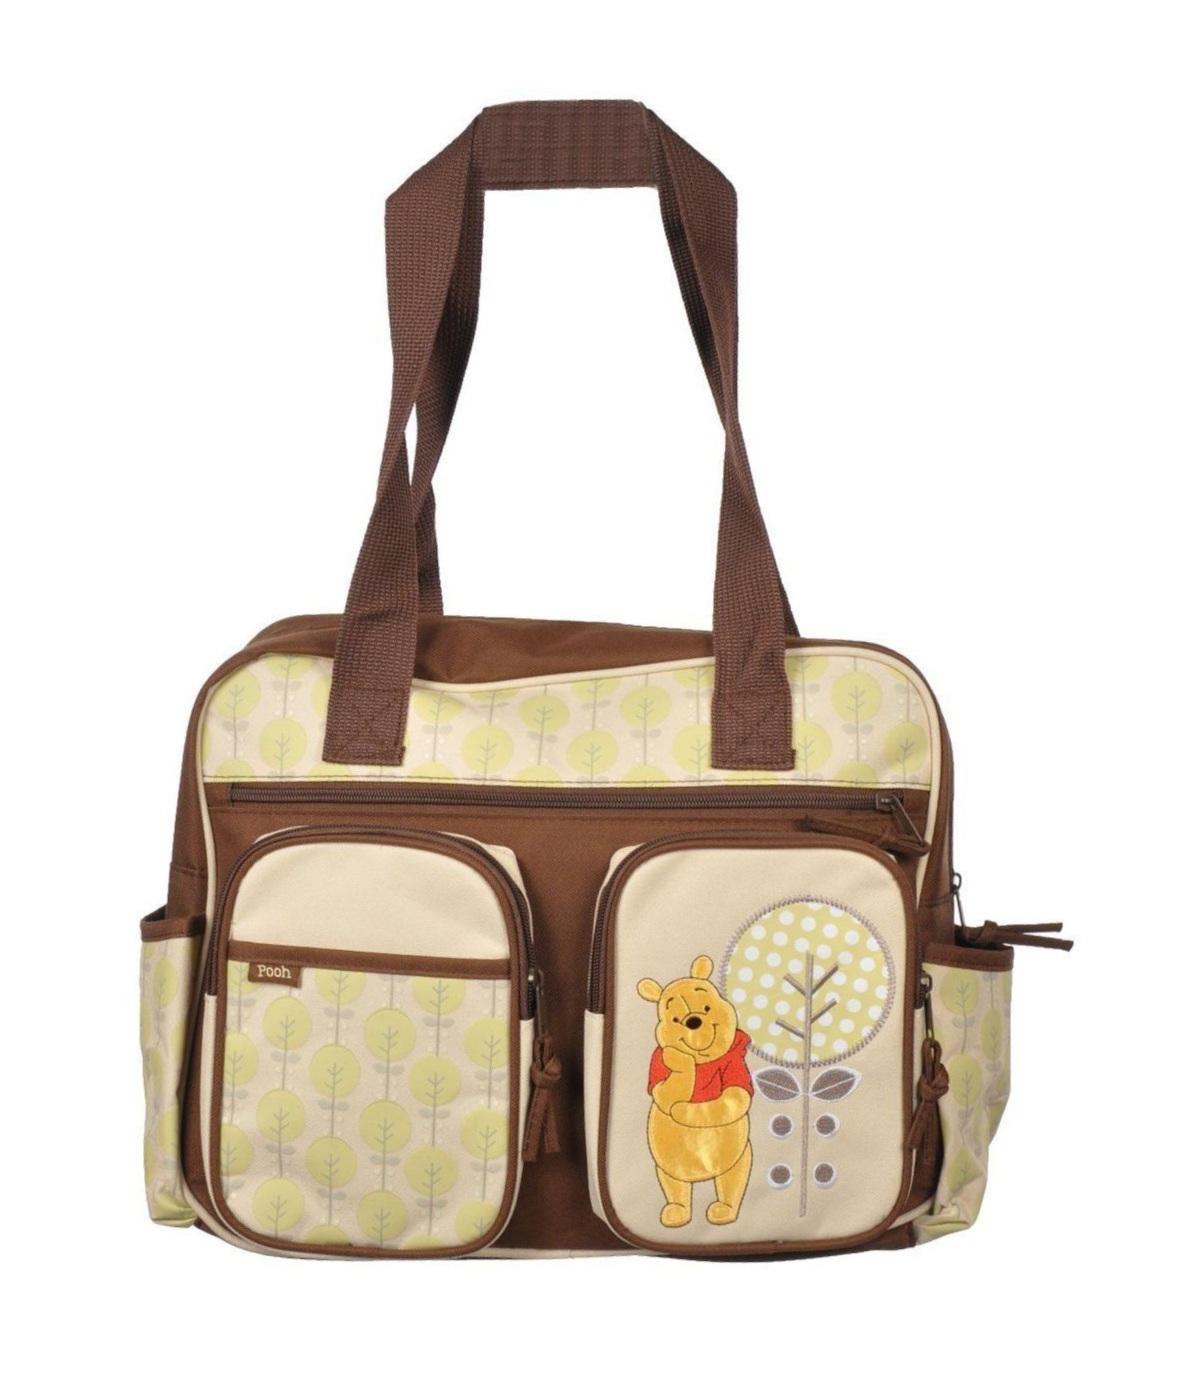 winnie the pooh diaper bag trendy diaper bags diaper bags canada